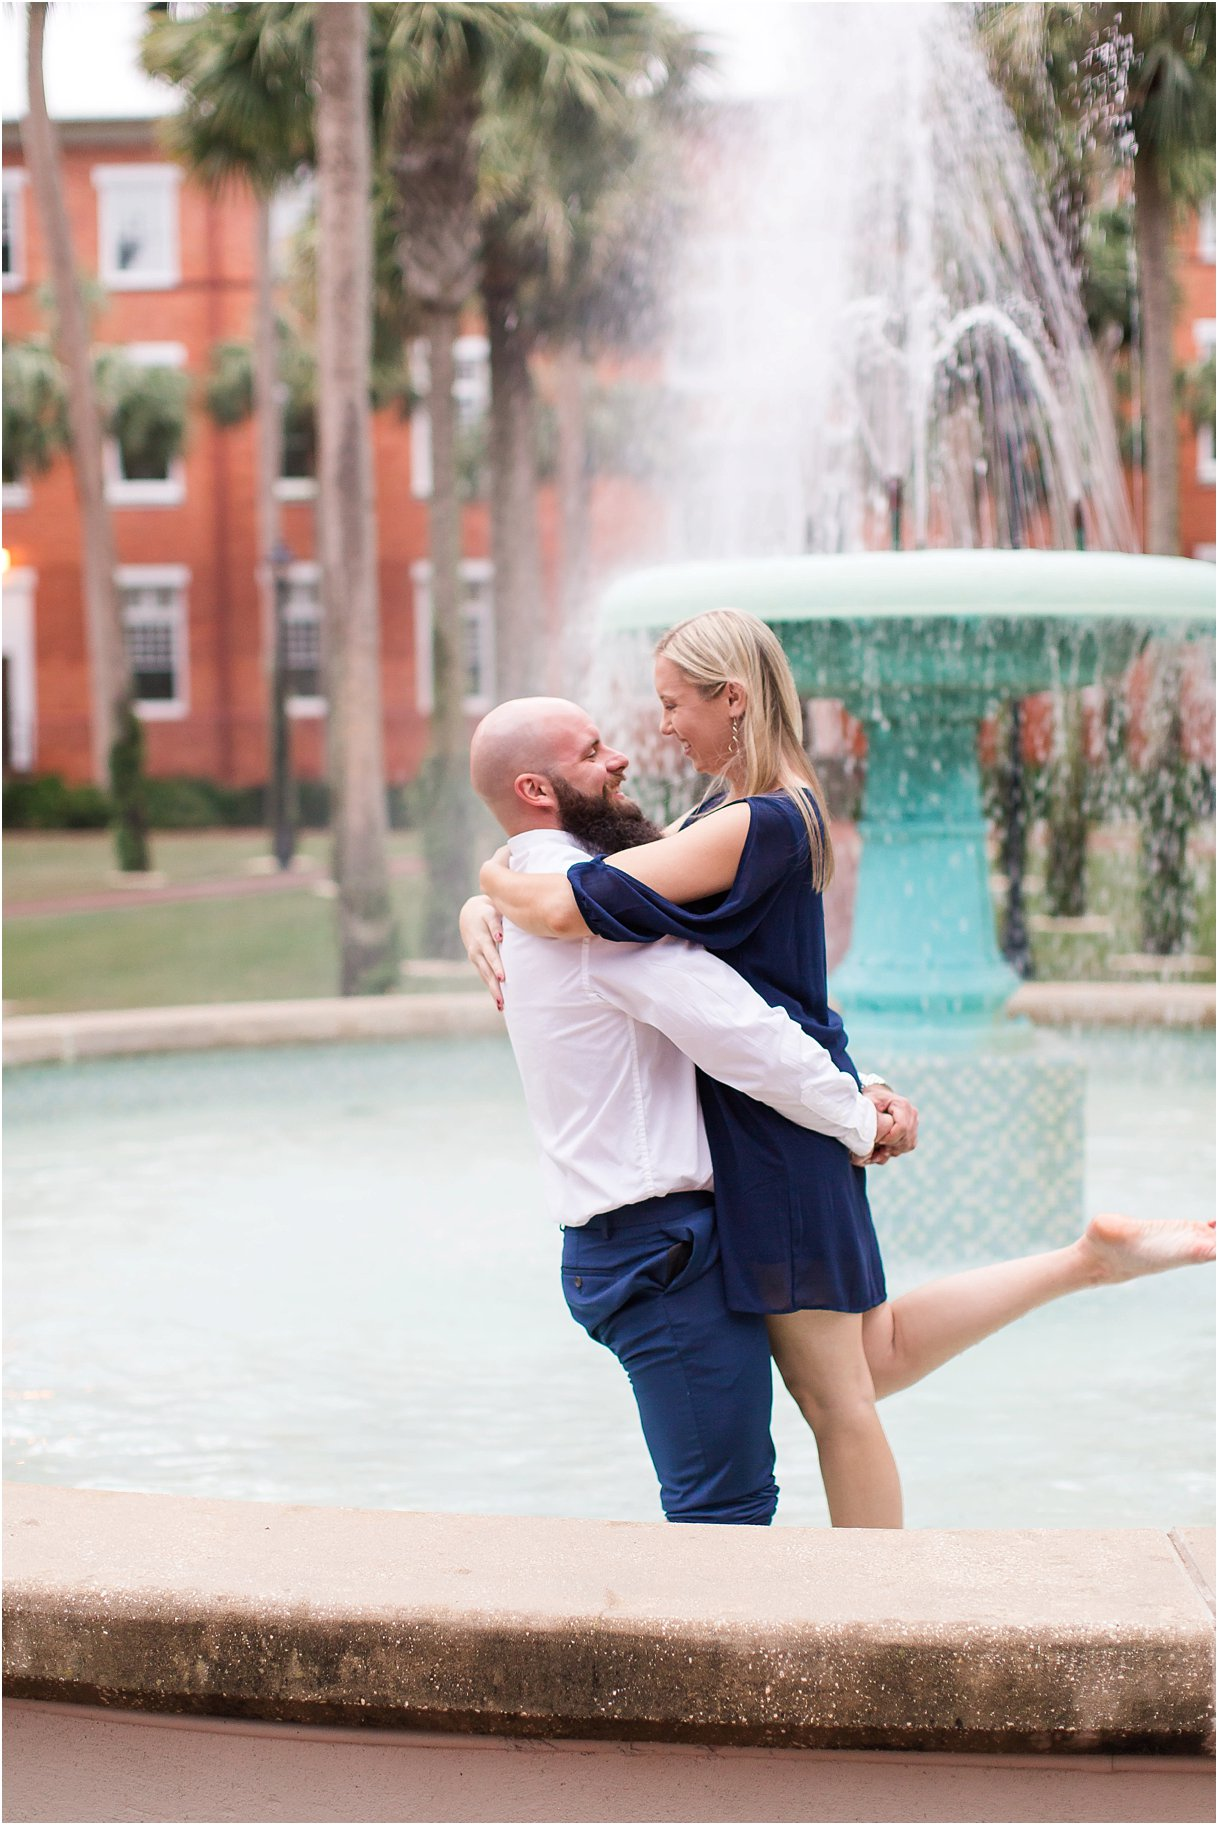 Stetson Florida Engagement Session Tampa St Augustine DeLand1.jpg